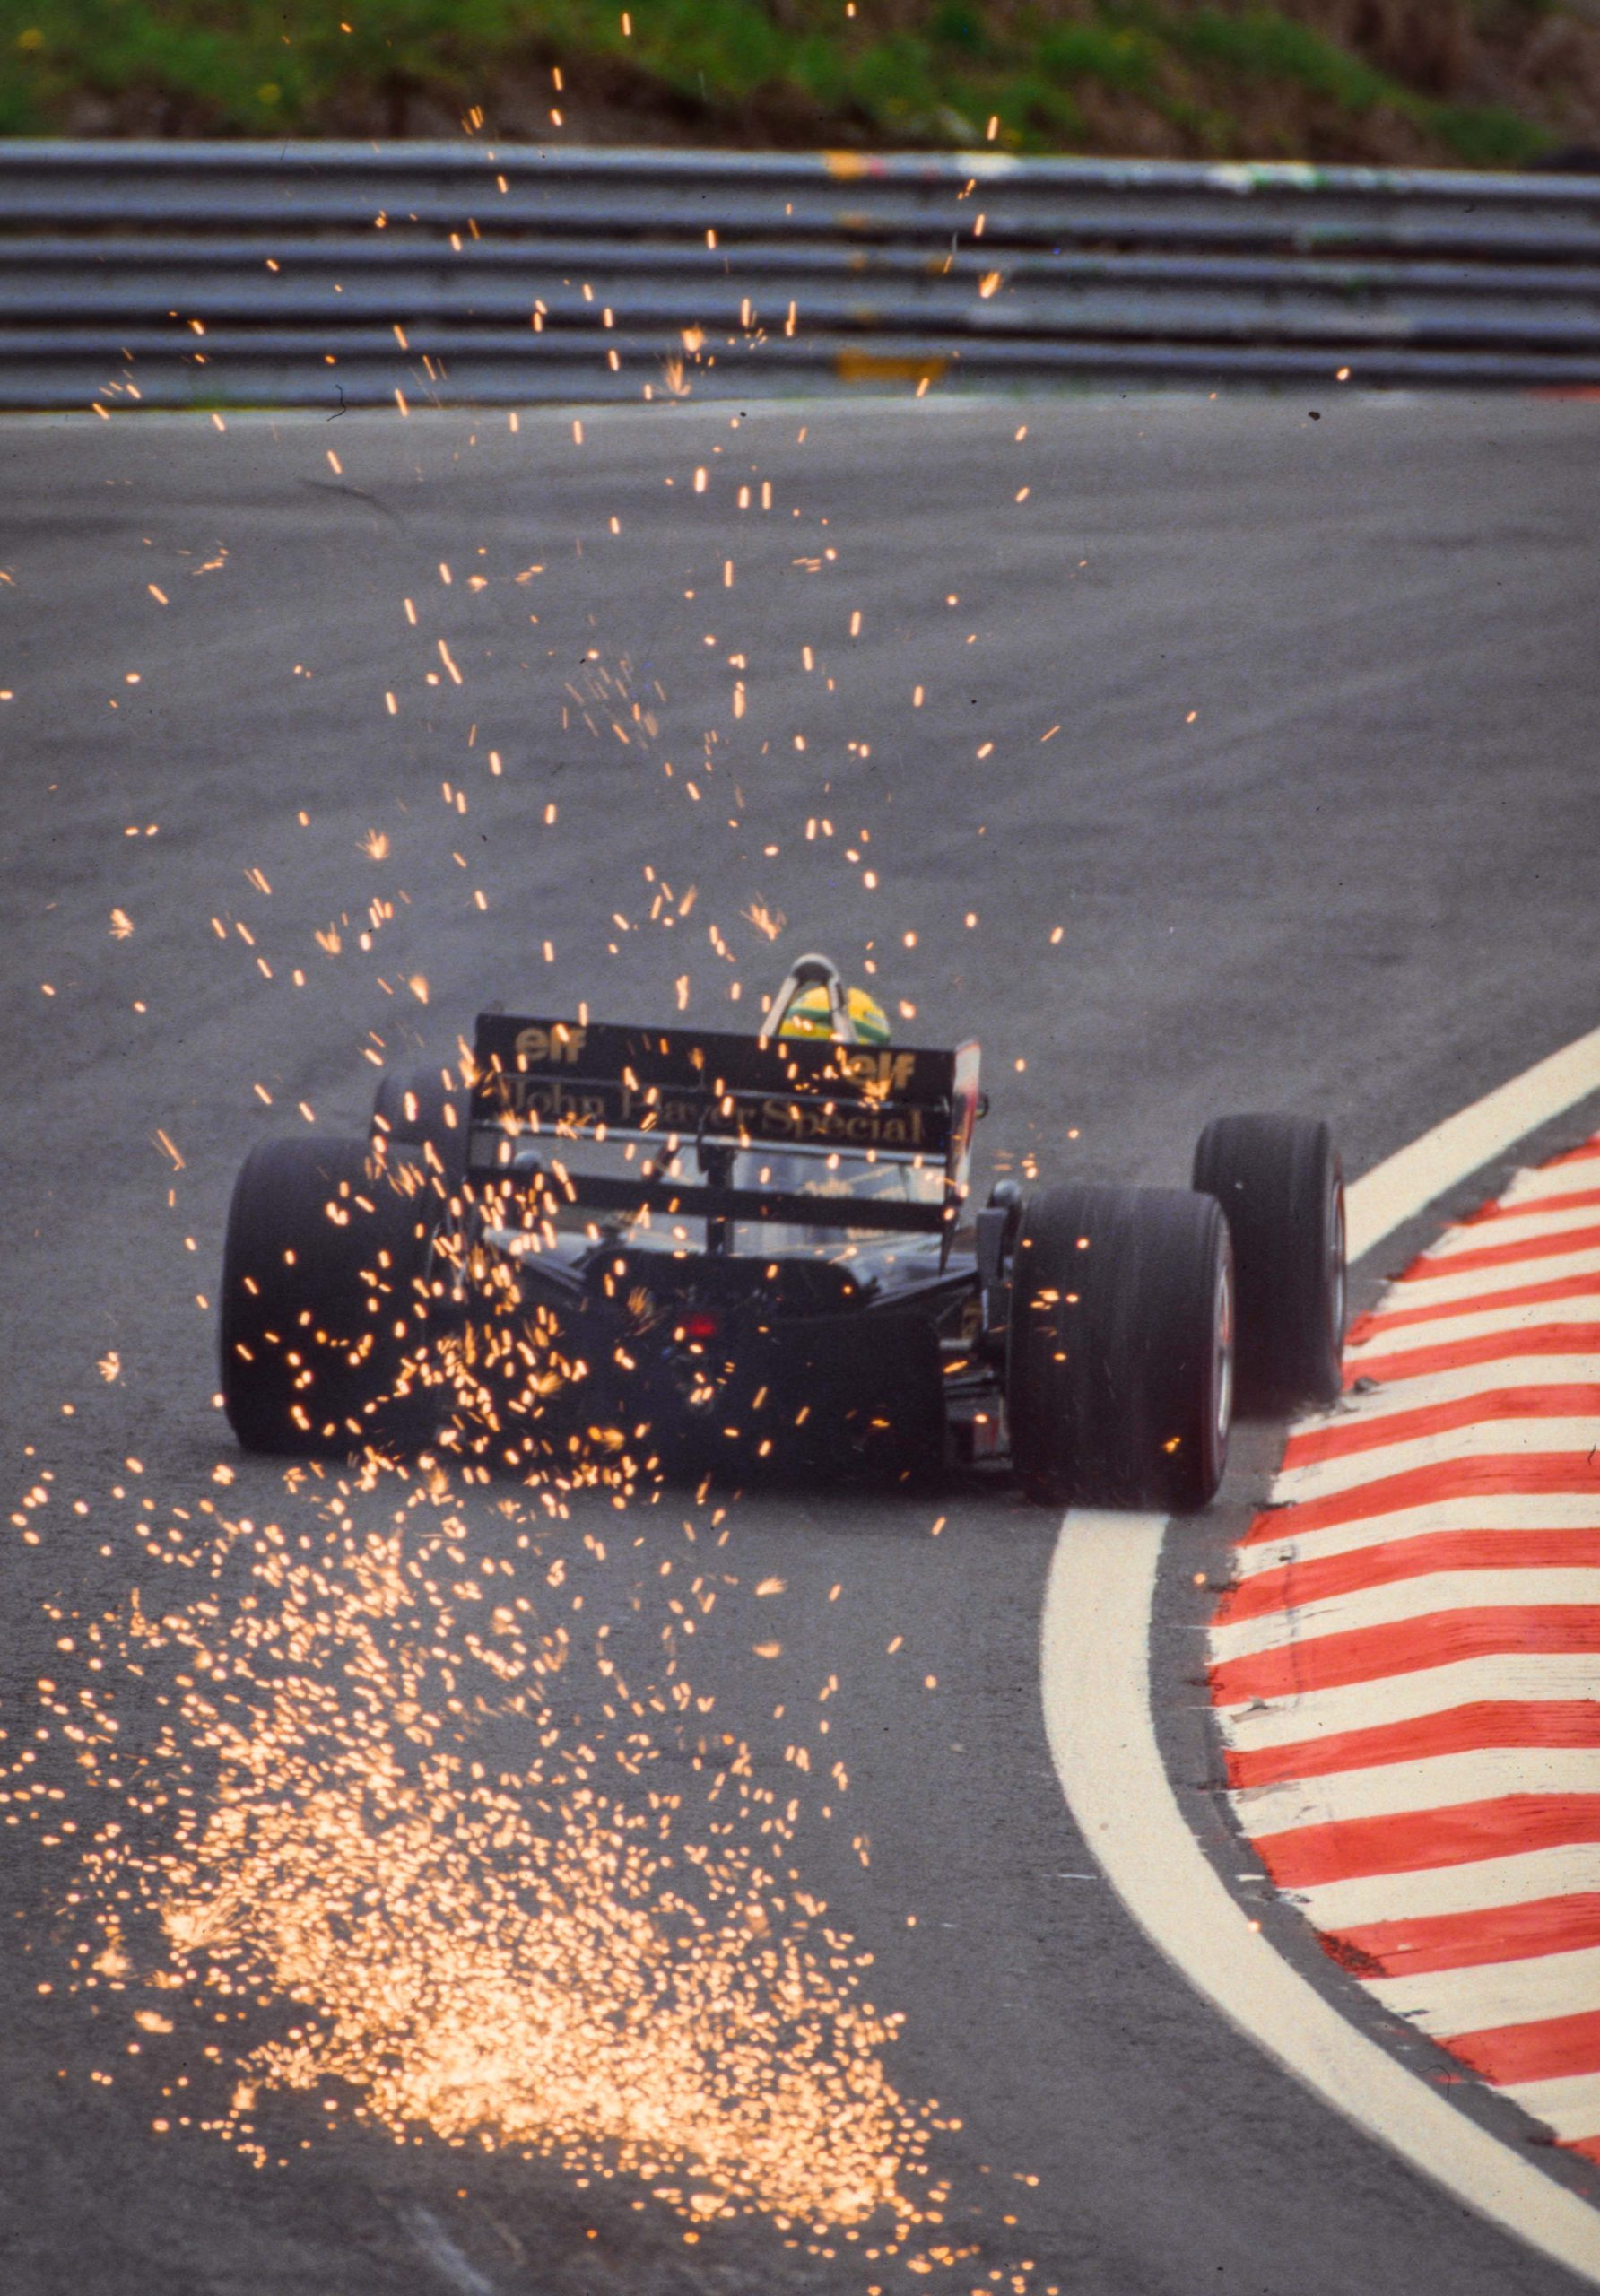 7.-Sparks-fly-from-Ayrton-Sennas-Lotus-at-the-1986-Belgian-Grand-Prix-scaled.jpg